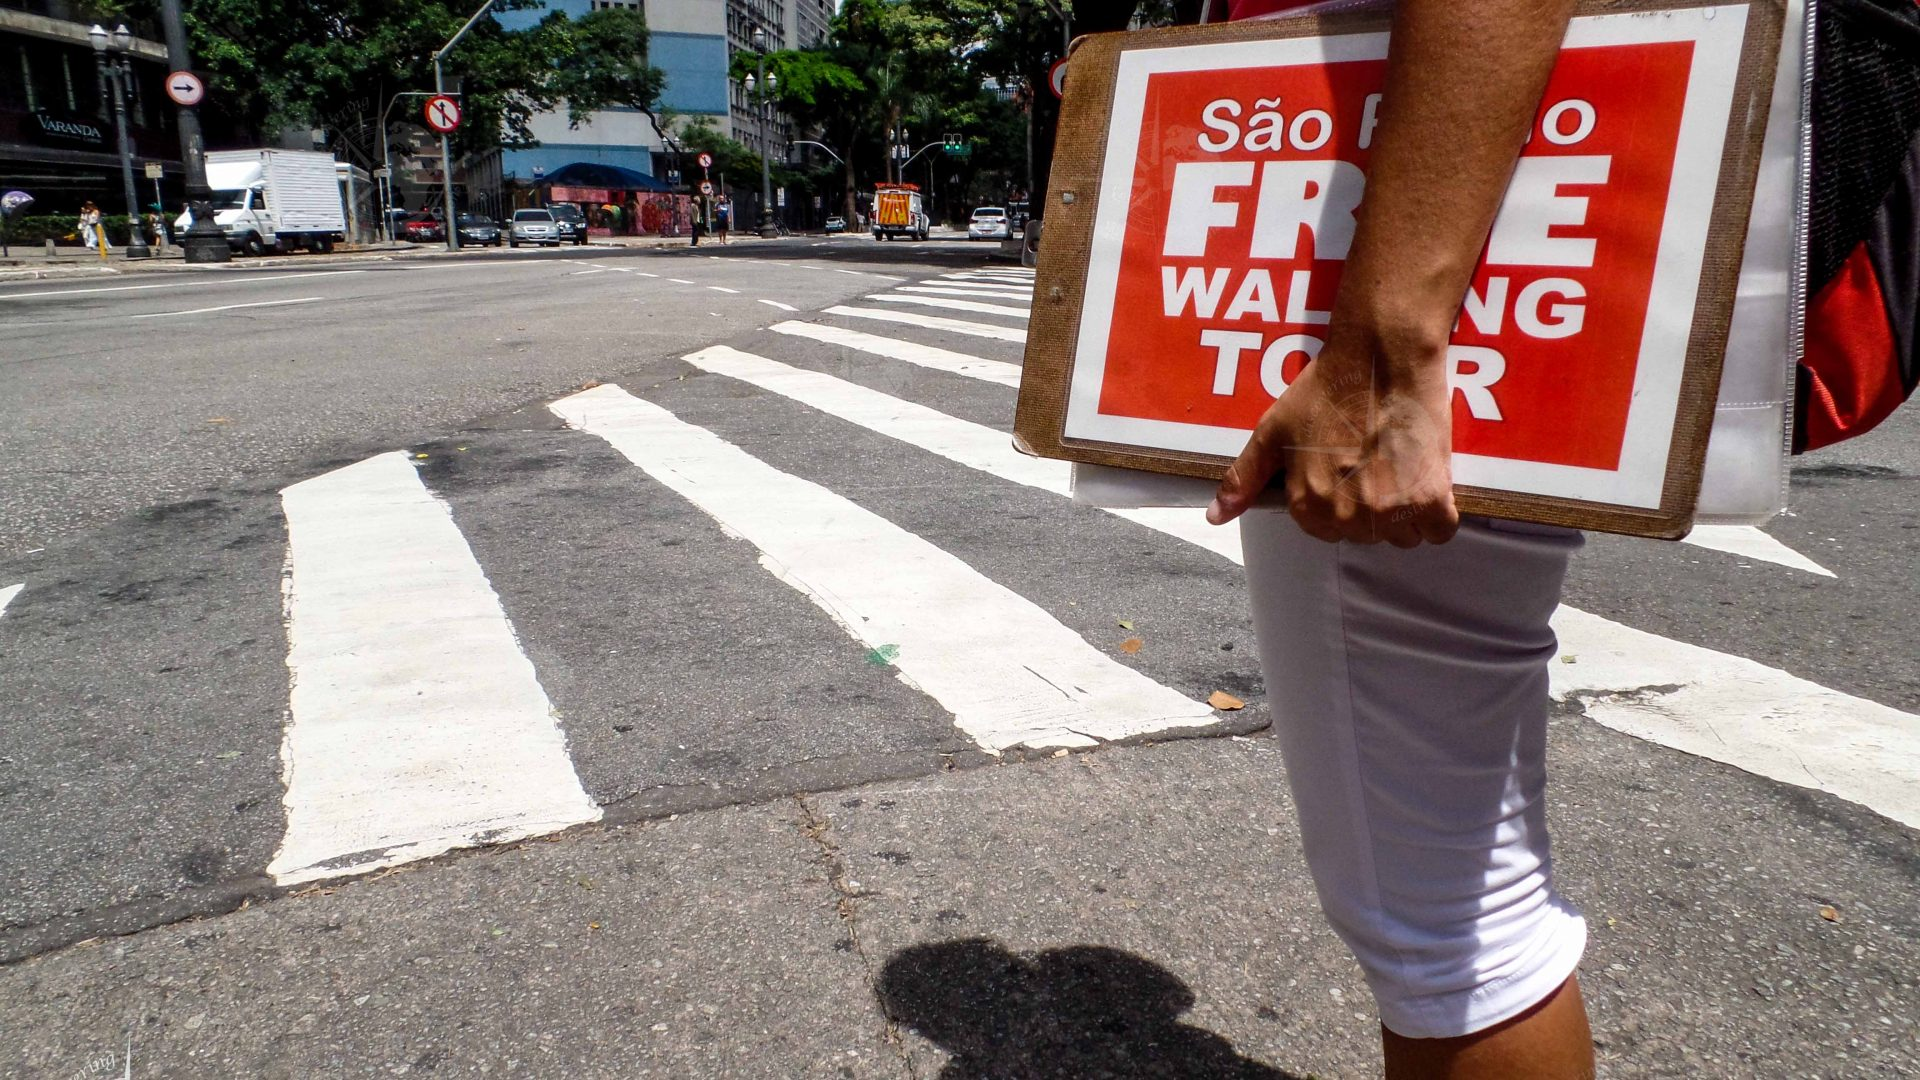 Free Walking Tour São Paulo Old Town - Brazil